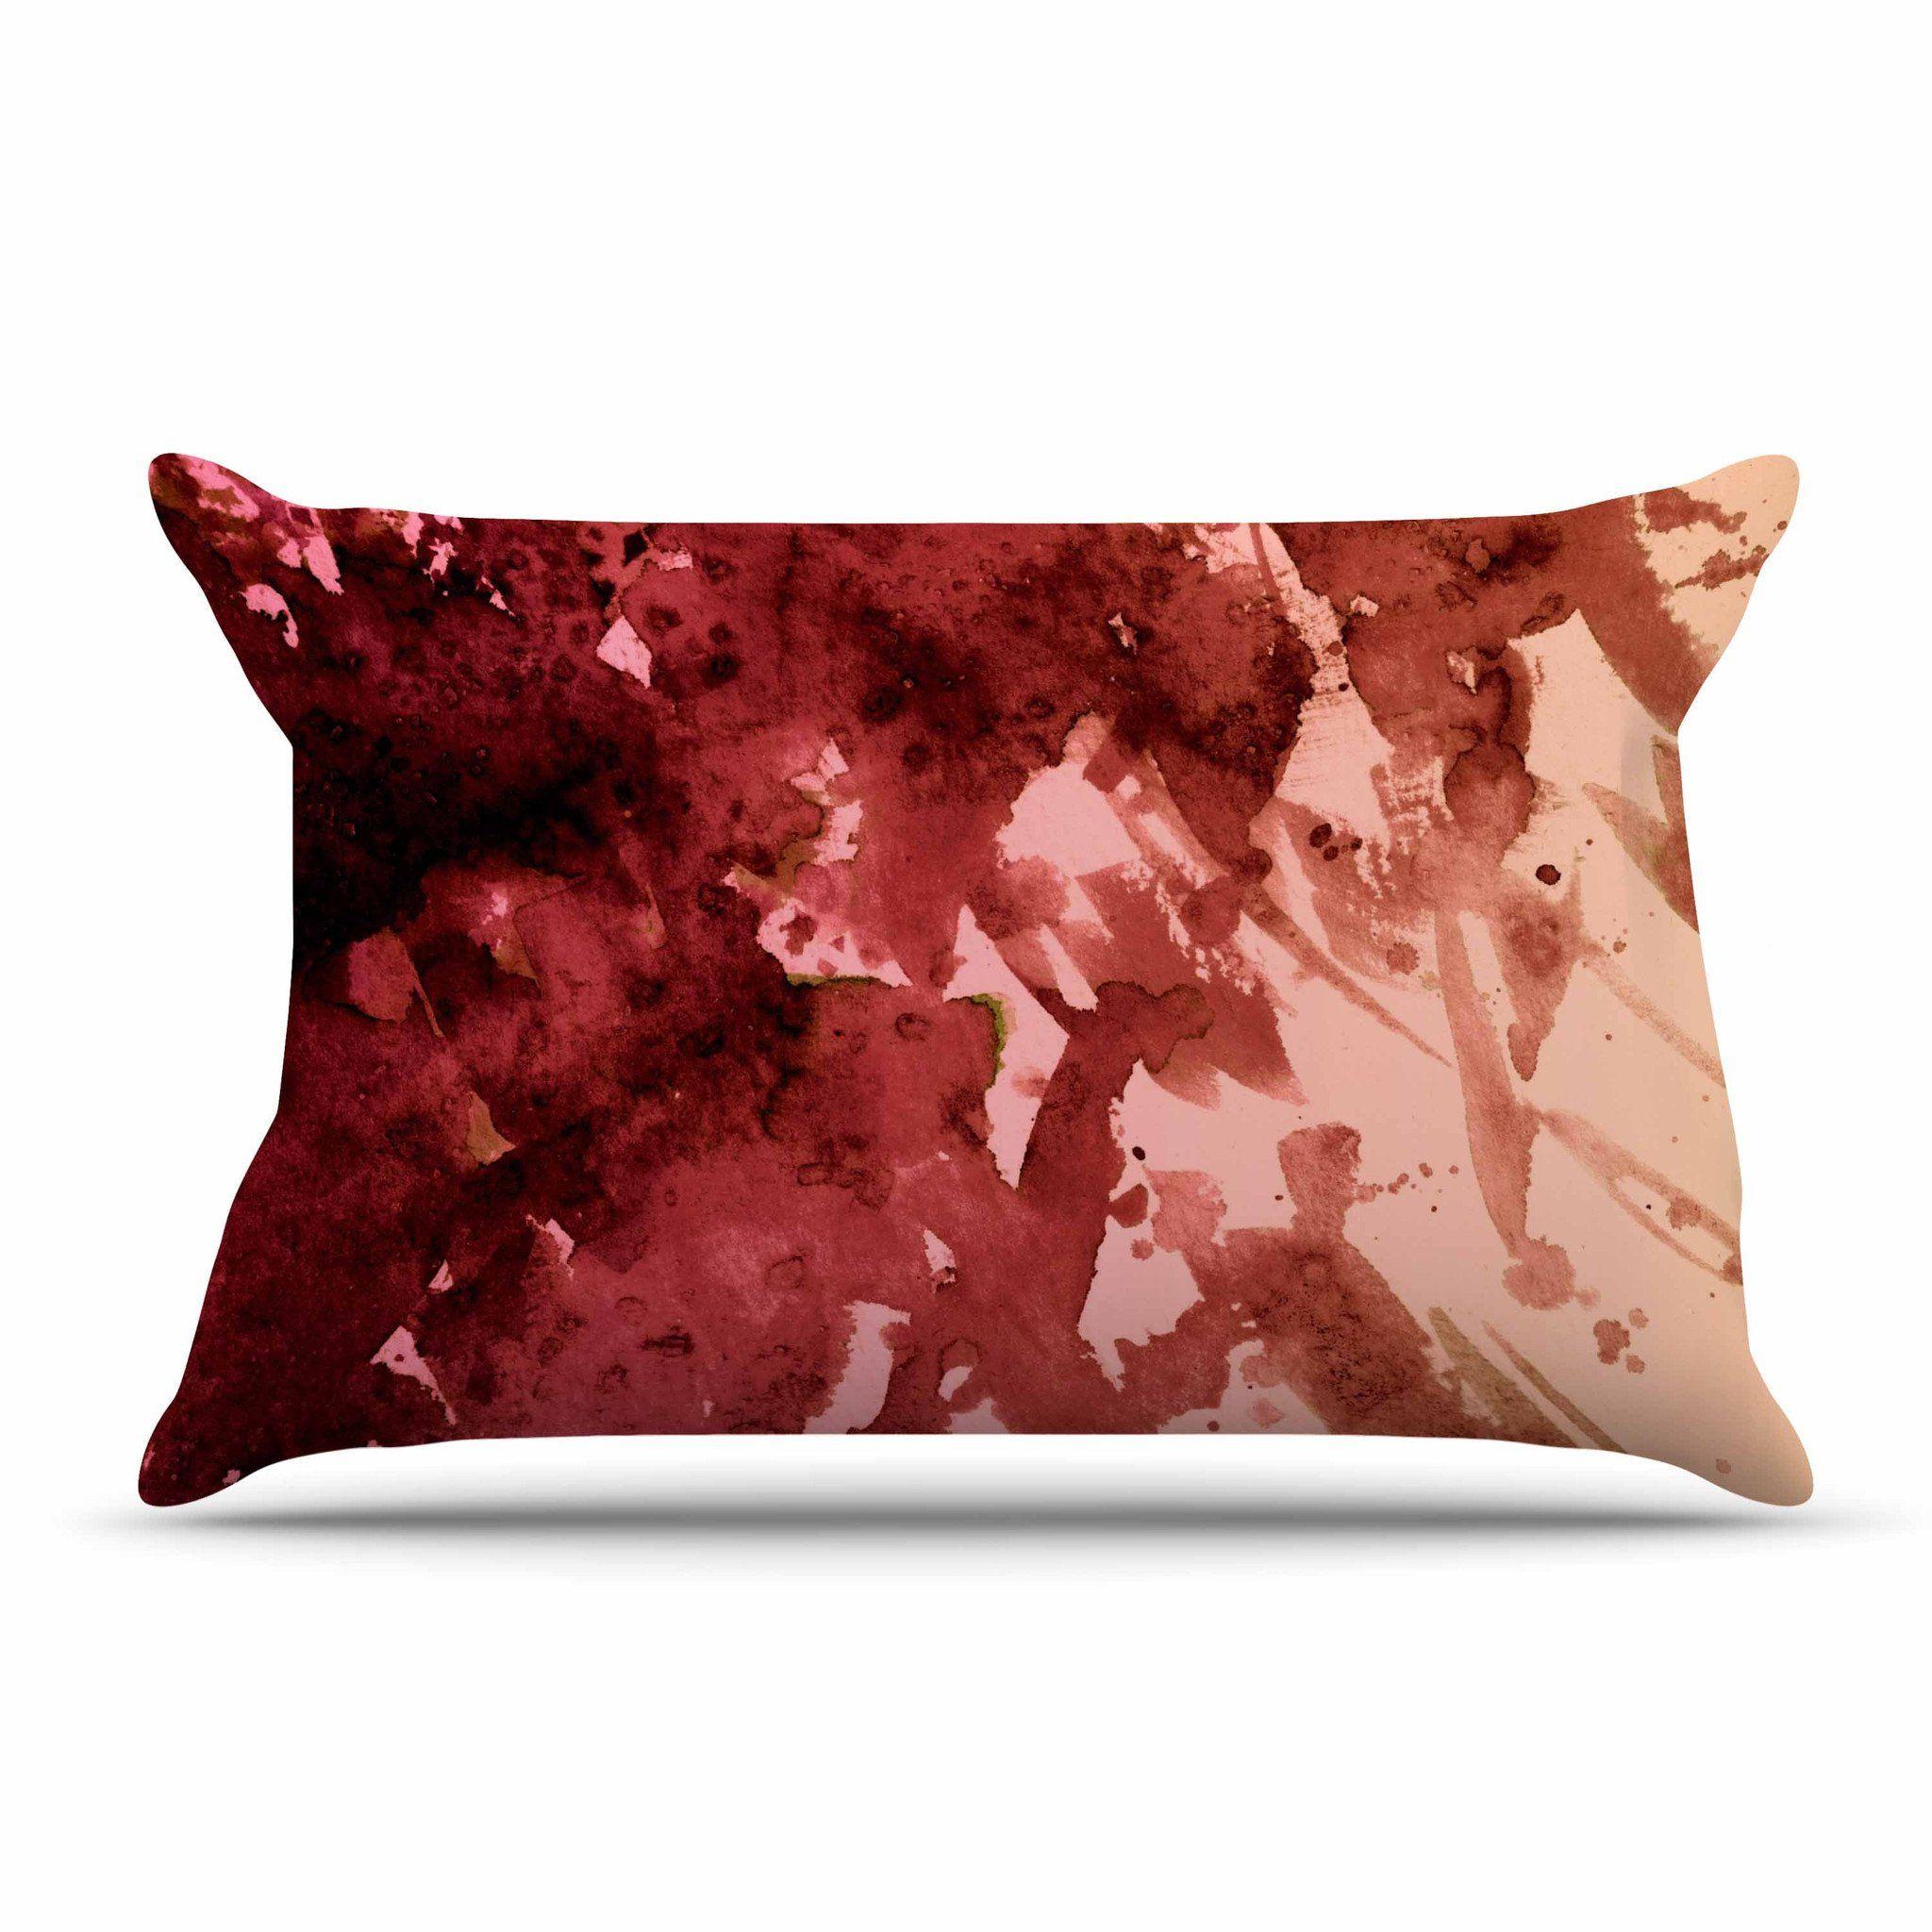 co pillowcase pillowcases kip coral pillow set birds cotton bed of paradise adult cases